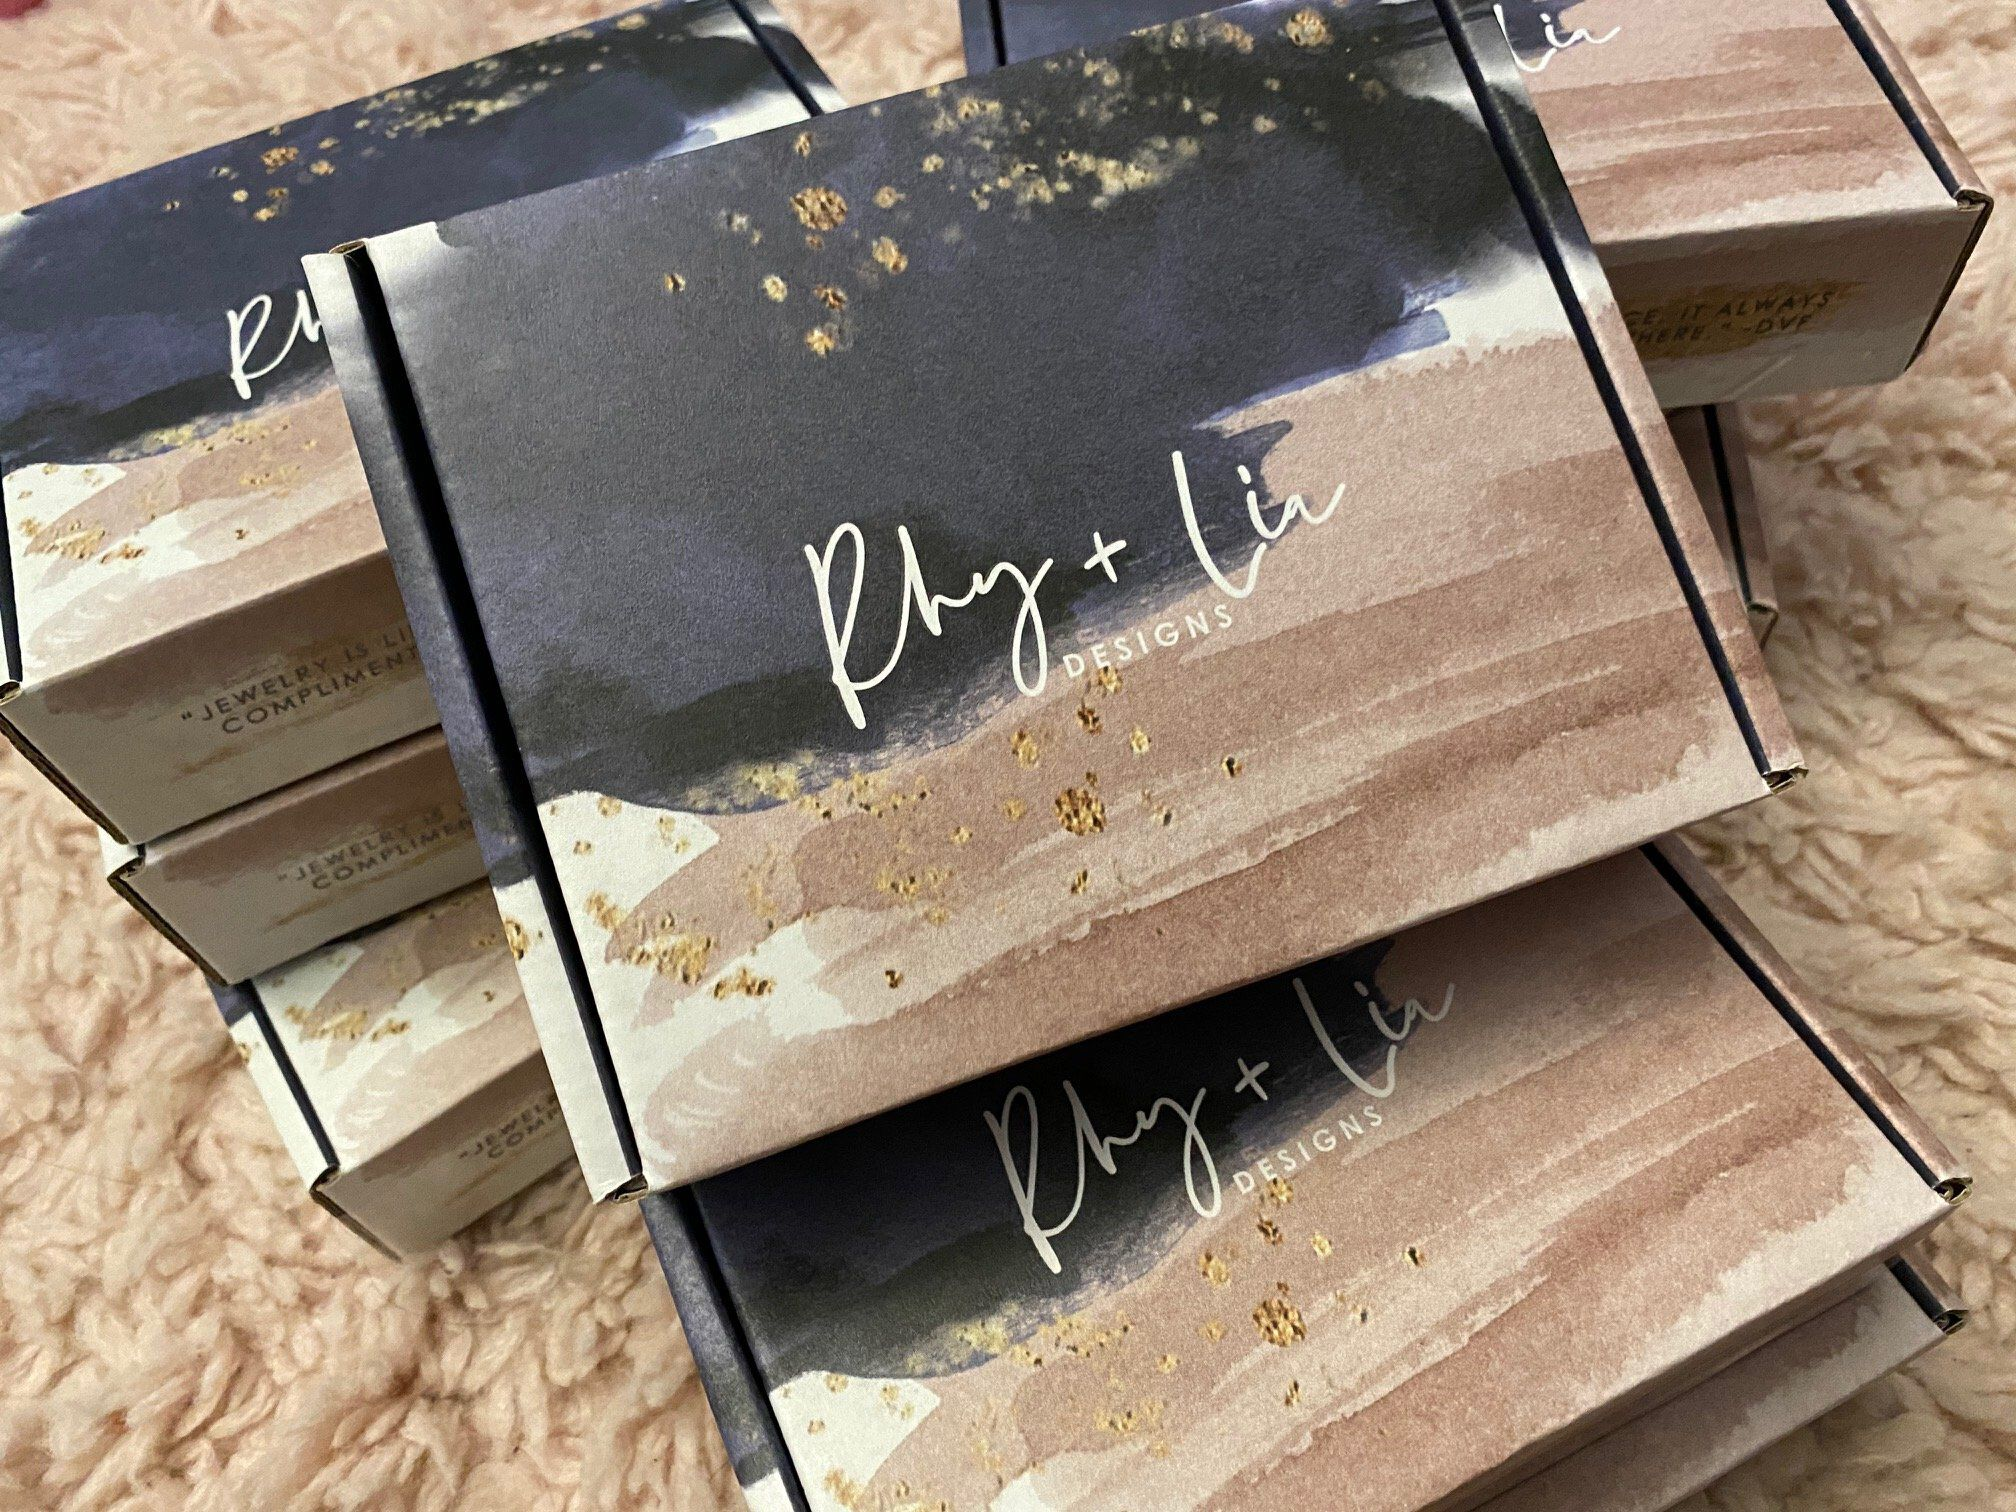 Rhy &Lia Jewelry Boxes